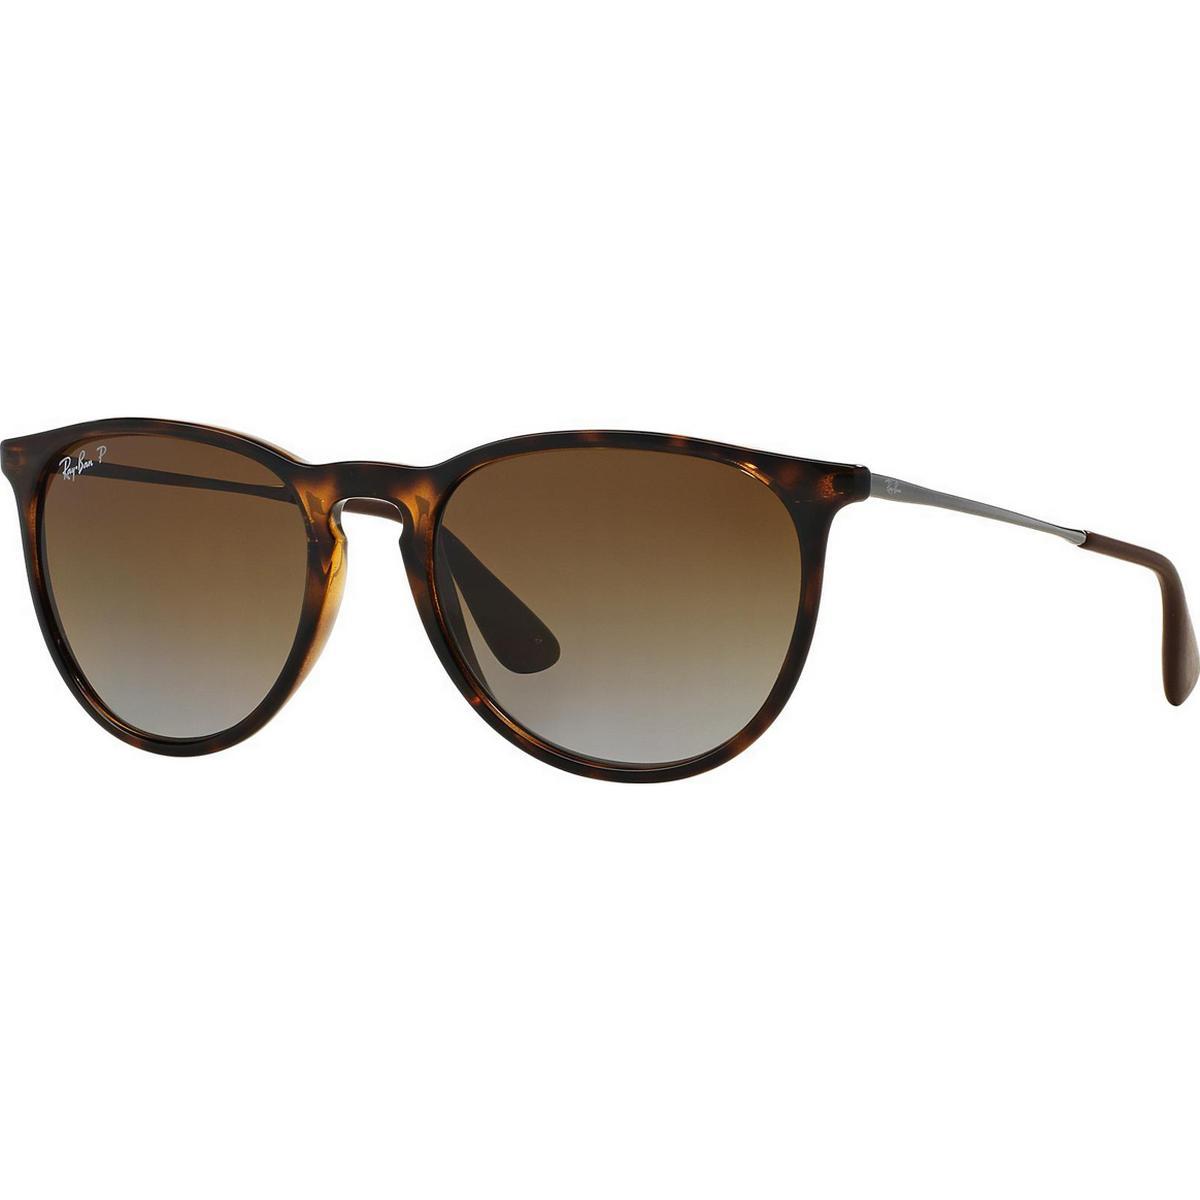 5cd220adc5bc Polariseret Solbriller - Sammenlign priser hos PriceRunner